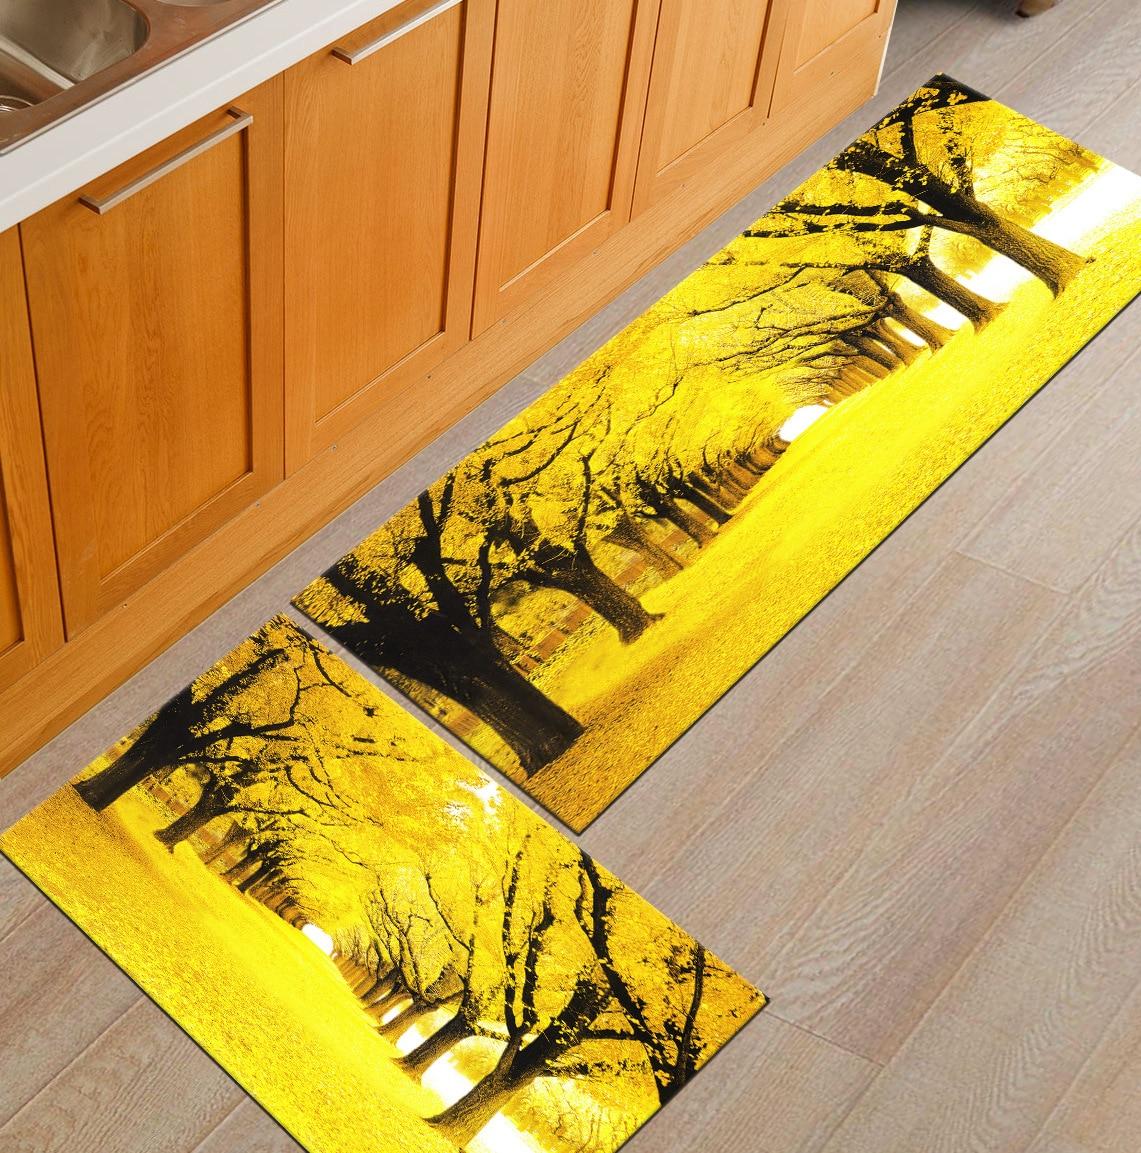 Us 19 32 44 Off Zeegle Modern Bedroom Area Rugs Large Carpets For Living Room Parlor Sofa Carpet Bathroom Bath Floor Mat Absorbent Kitchen Rug In